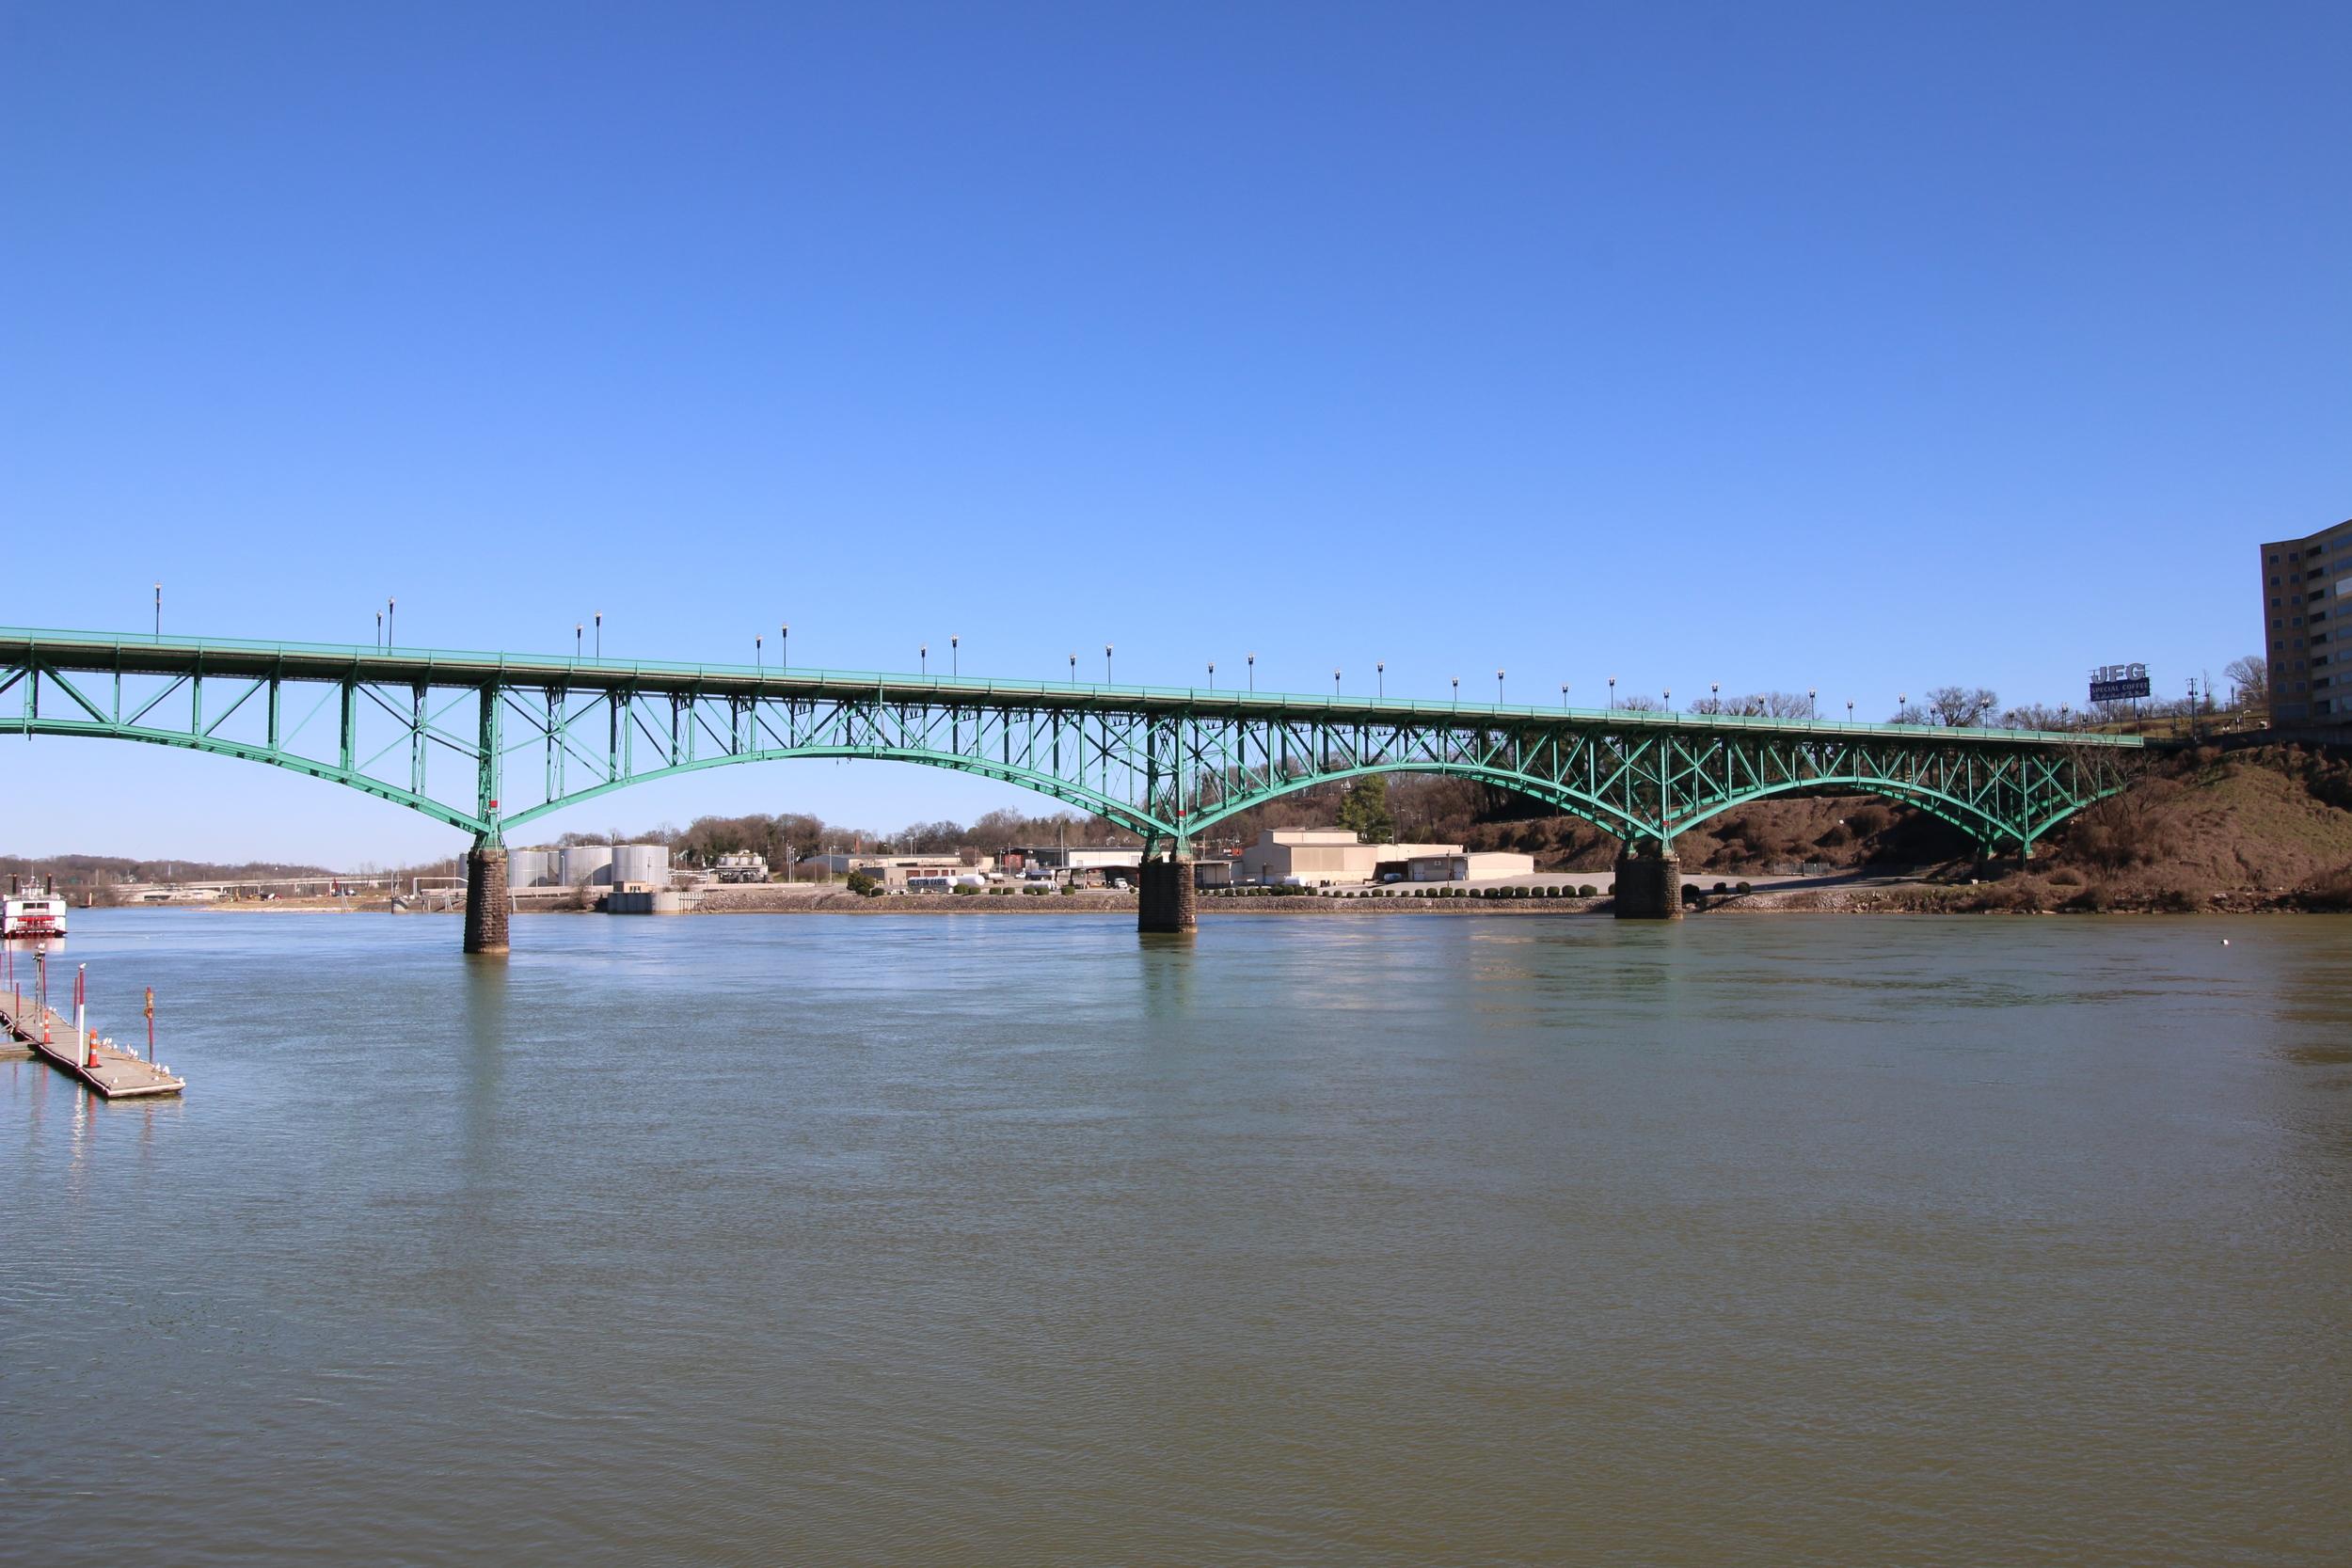 3RR Calhouns and Gay Street Bridge